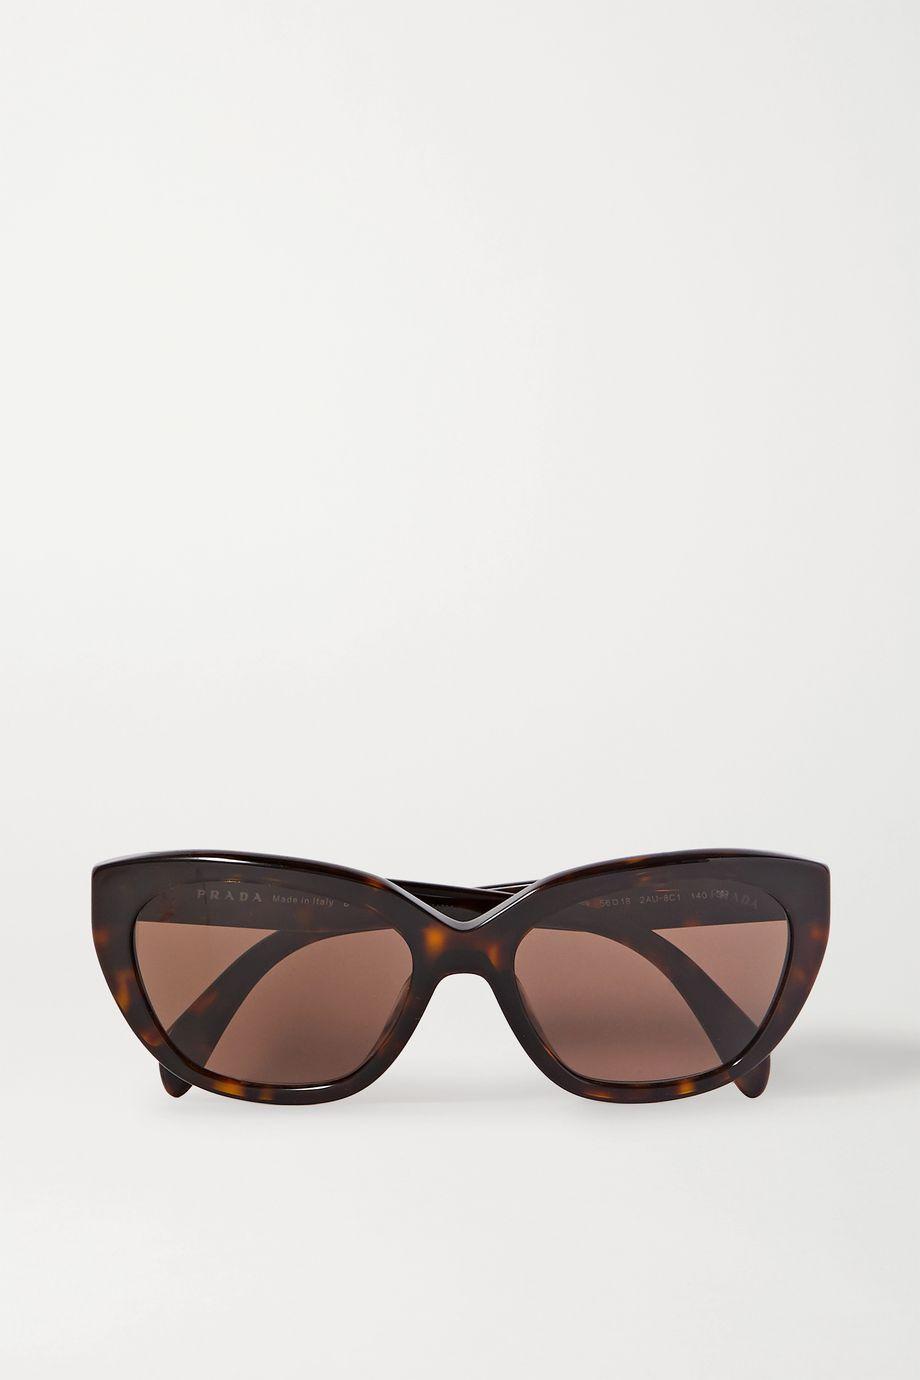 Prada Eyewear Round-frame tortoiseshell acetate sunglasses